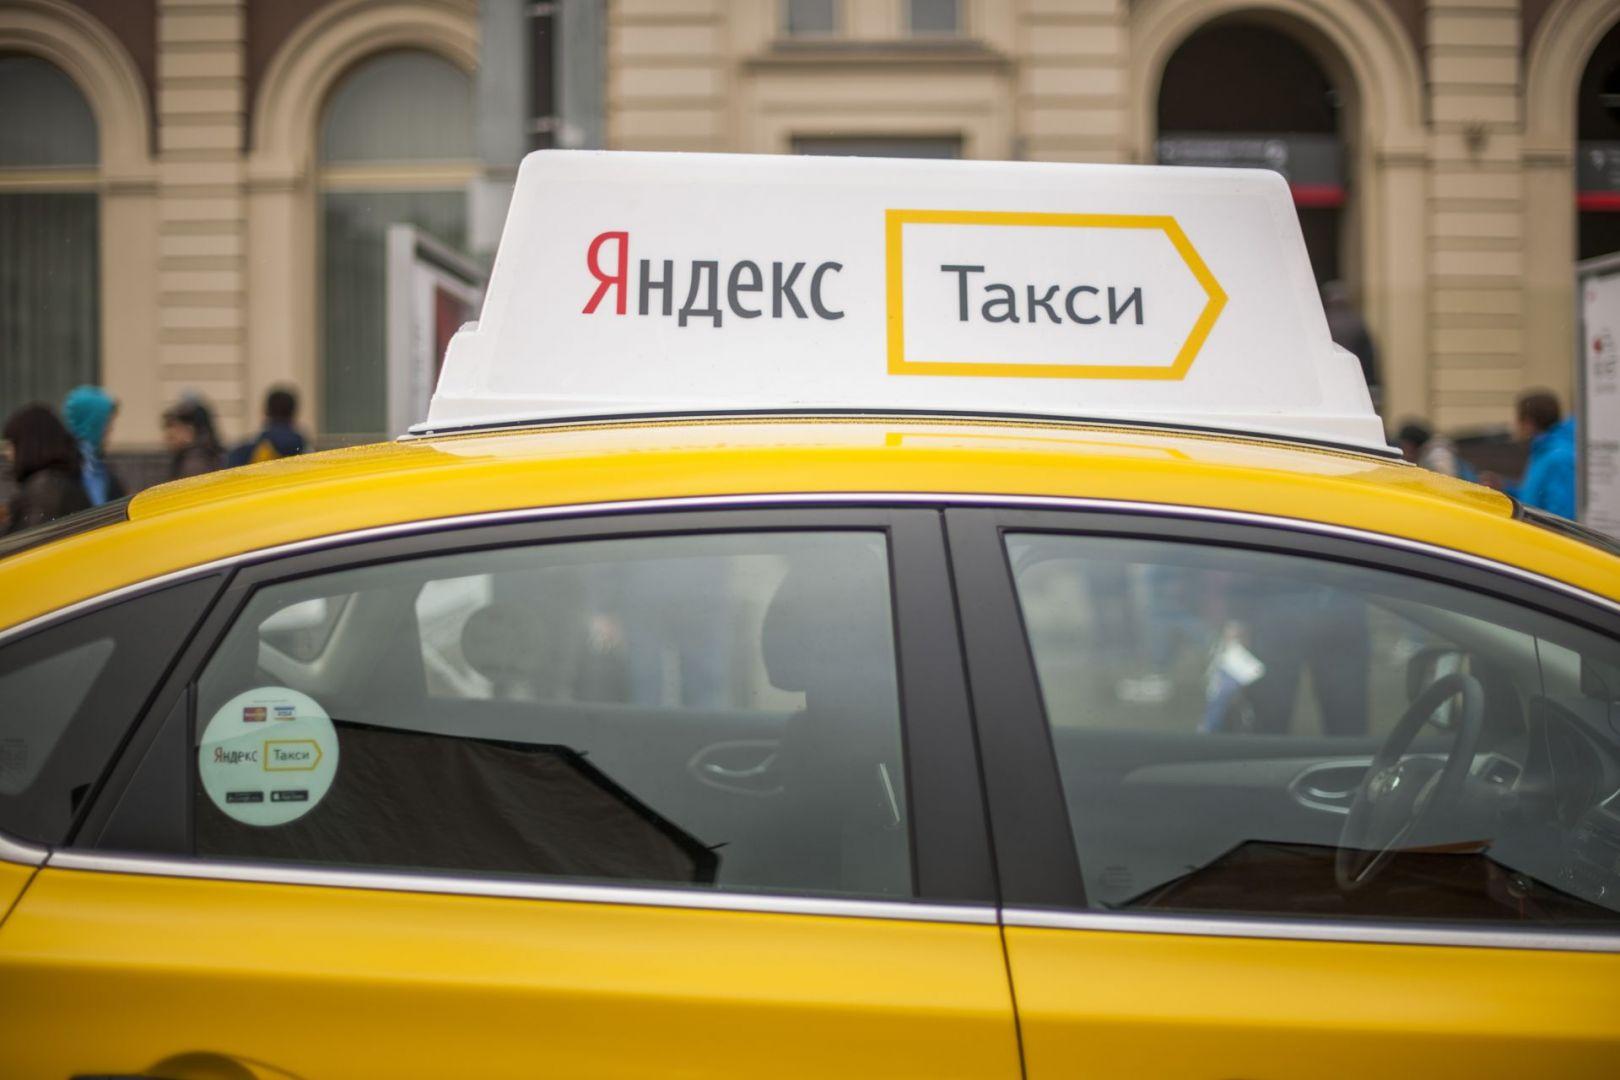 «Яндекс» запустил вКемерово сервис заказа такси